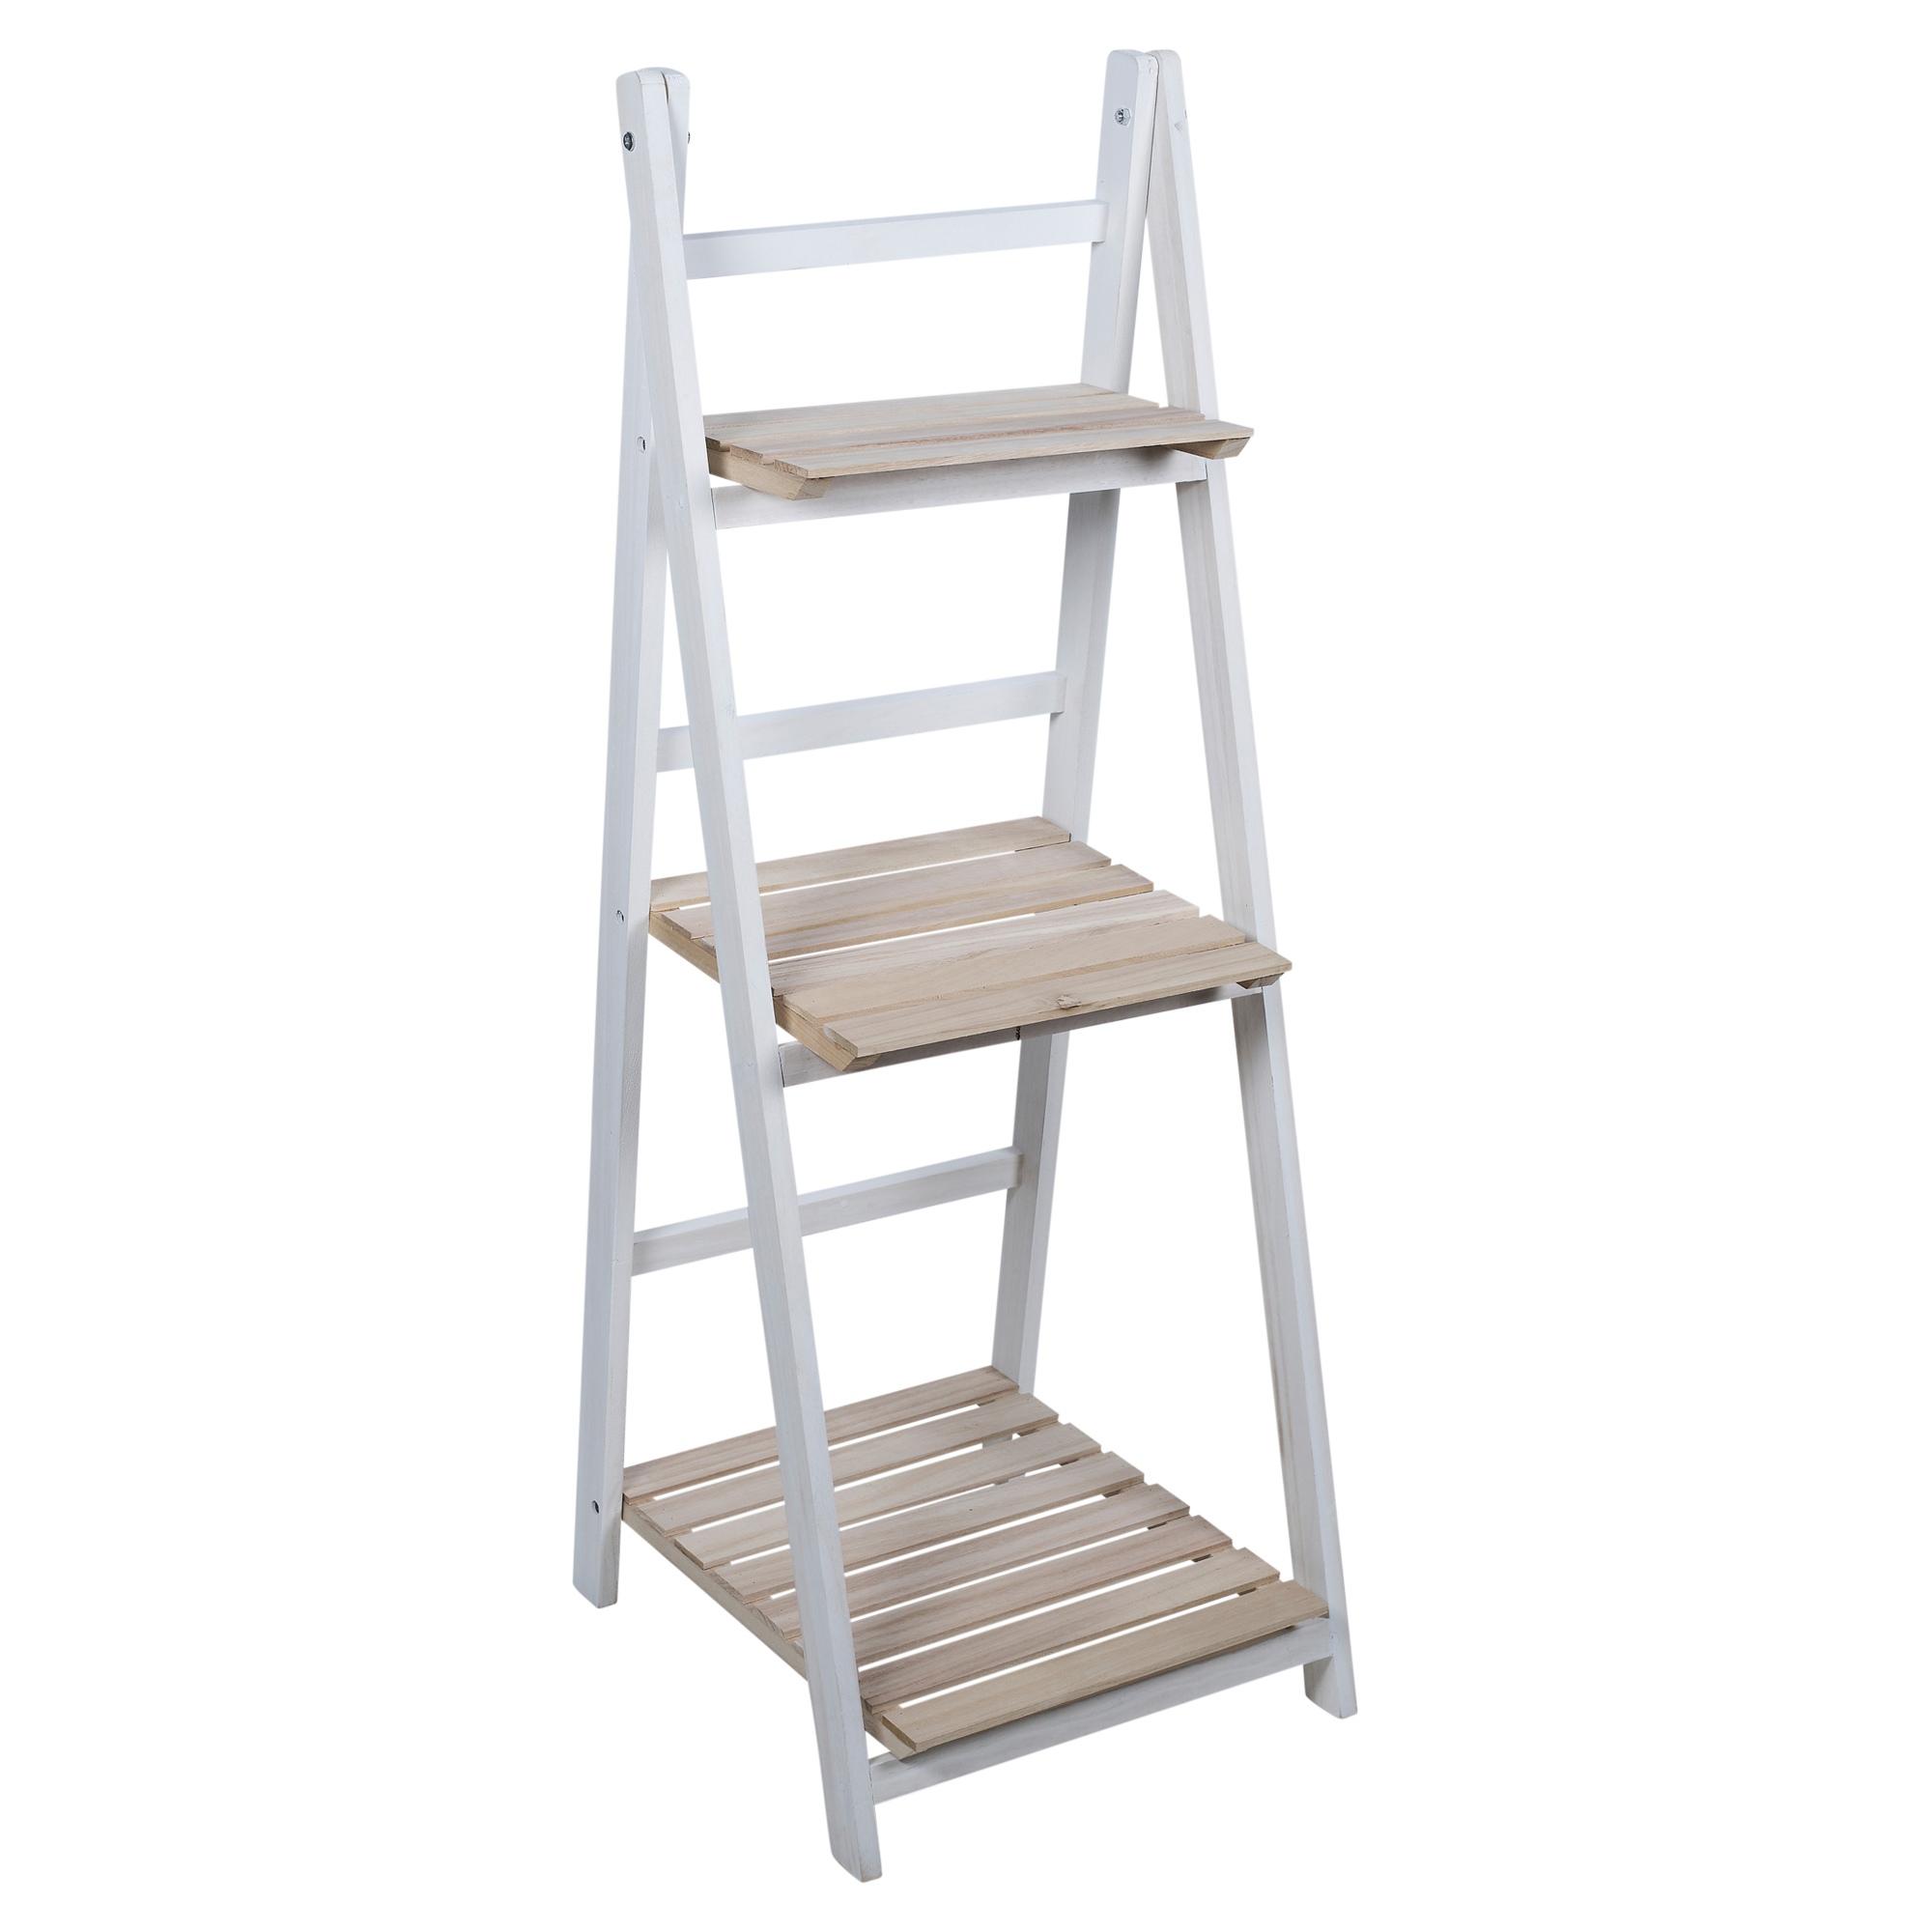 3 Tier Wooden Ladder Storage Rack Display Stand Shelving Unit Bathroom Bedroom Ebay